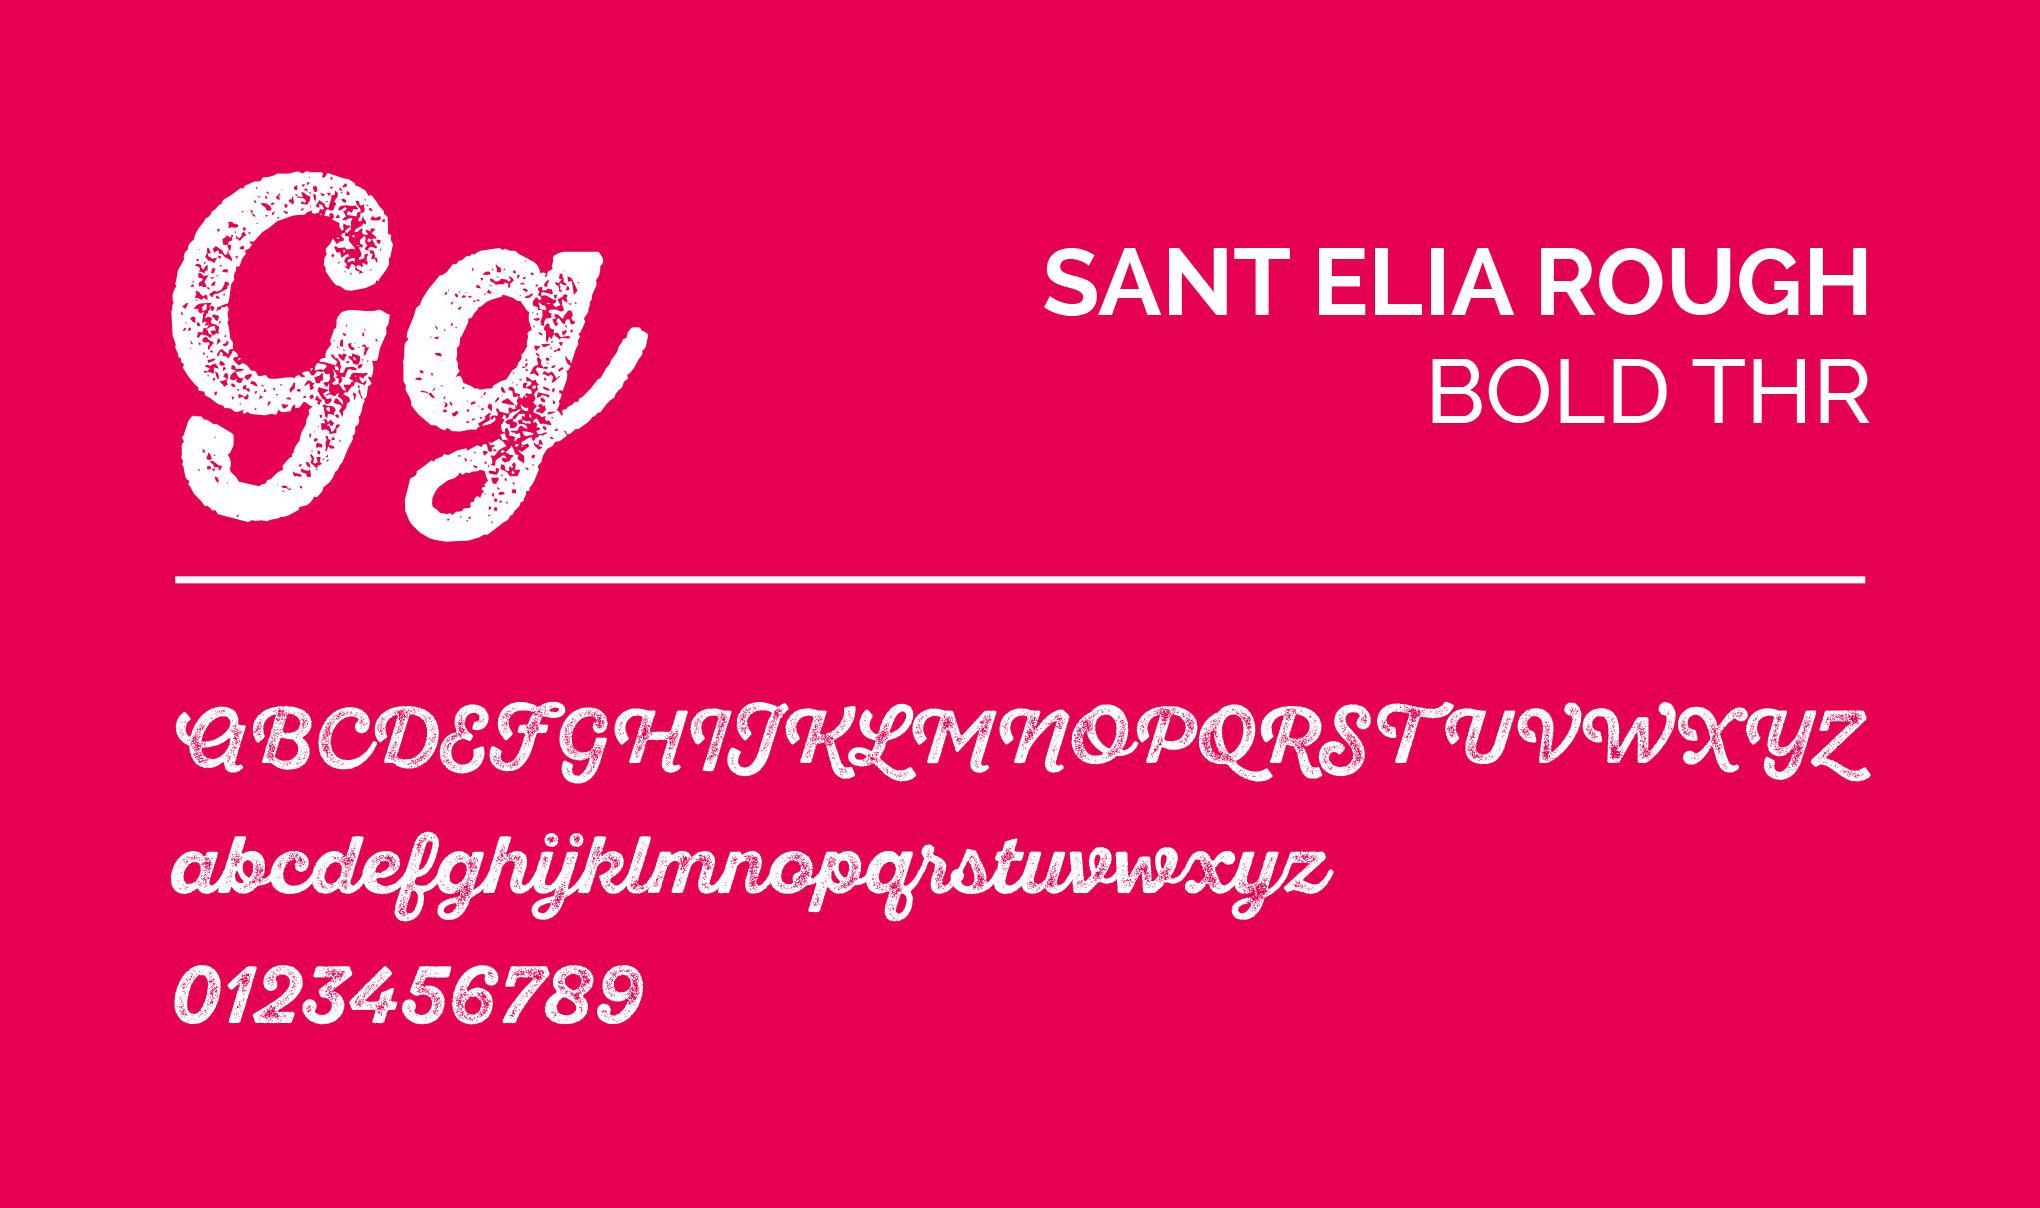 SANT ELIA ROUGH - Bold Thr. Font layout.